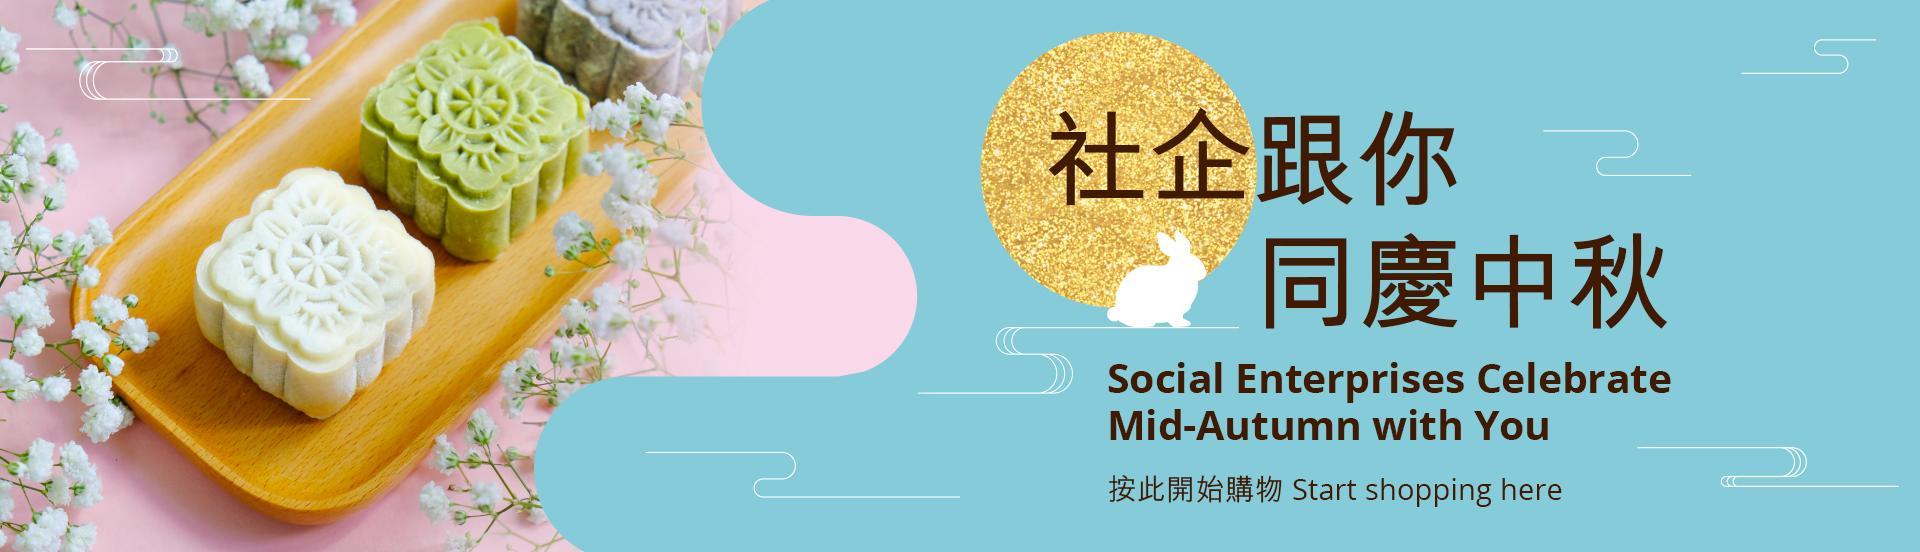 Social Enterprises Celebrate Mid-Autumn With You